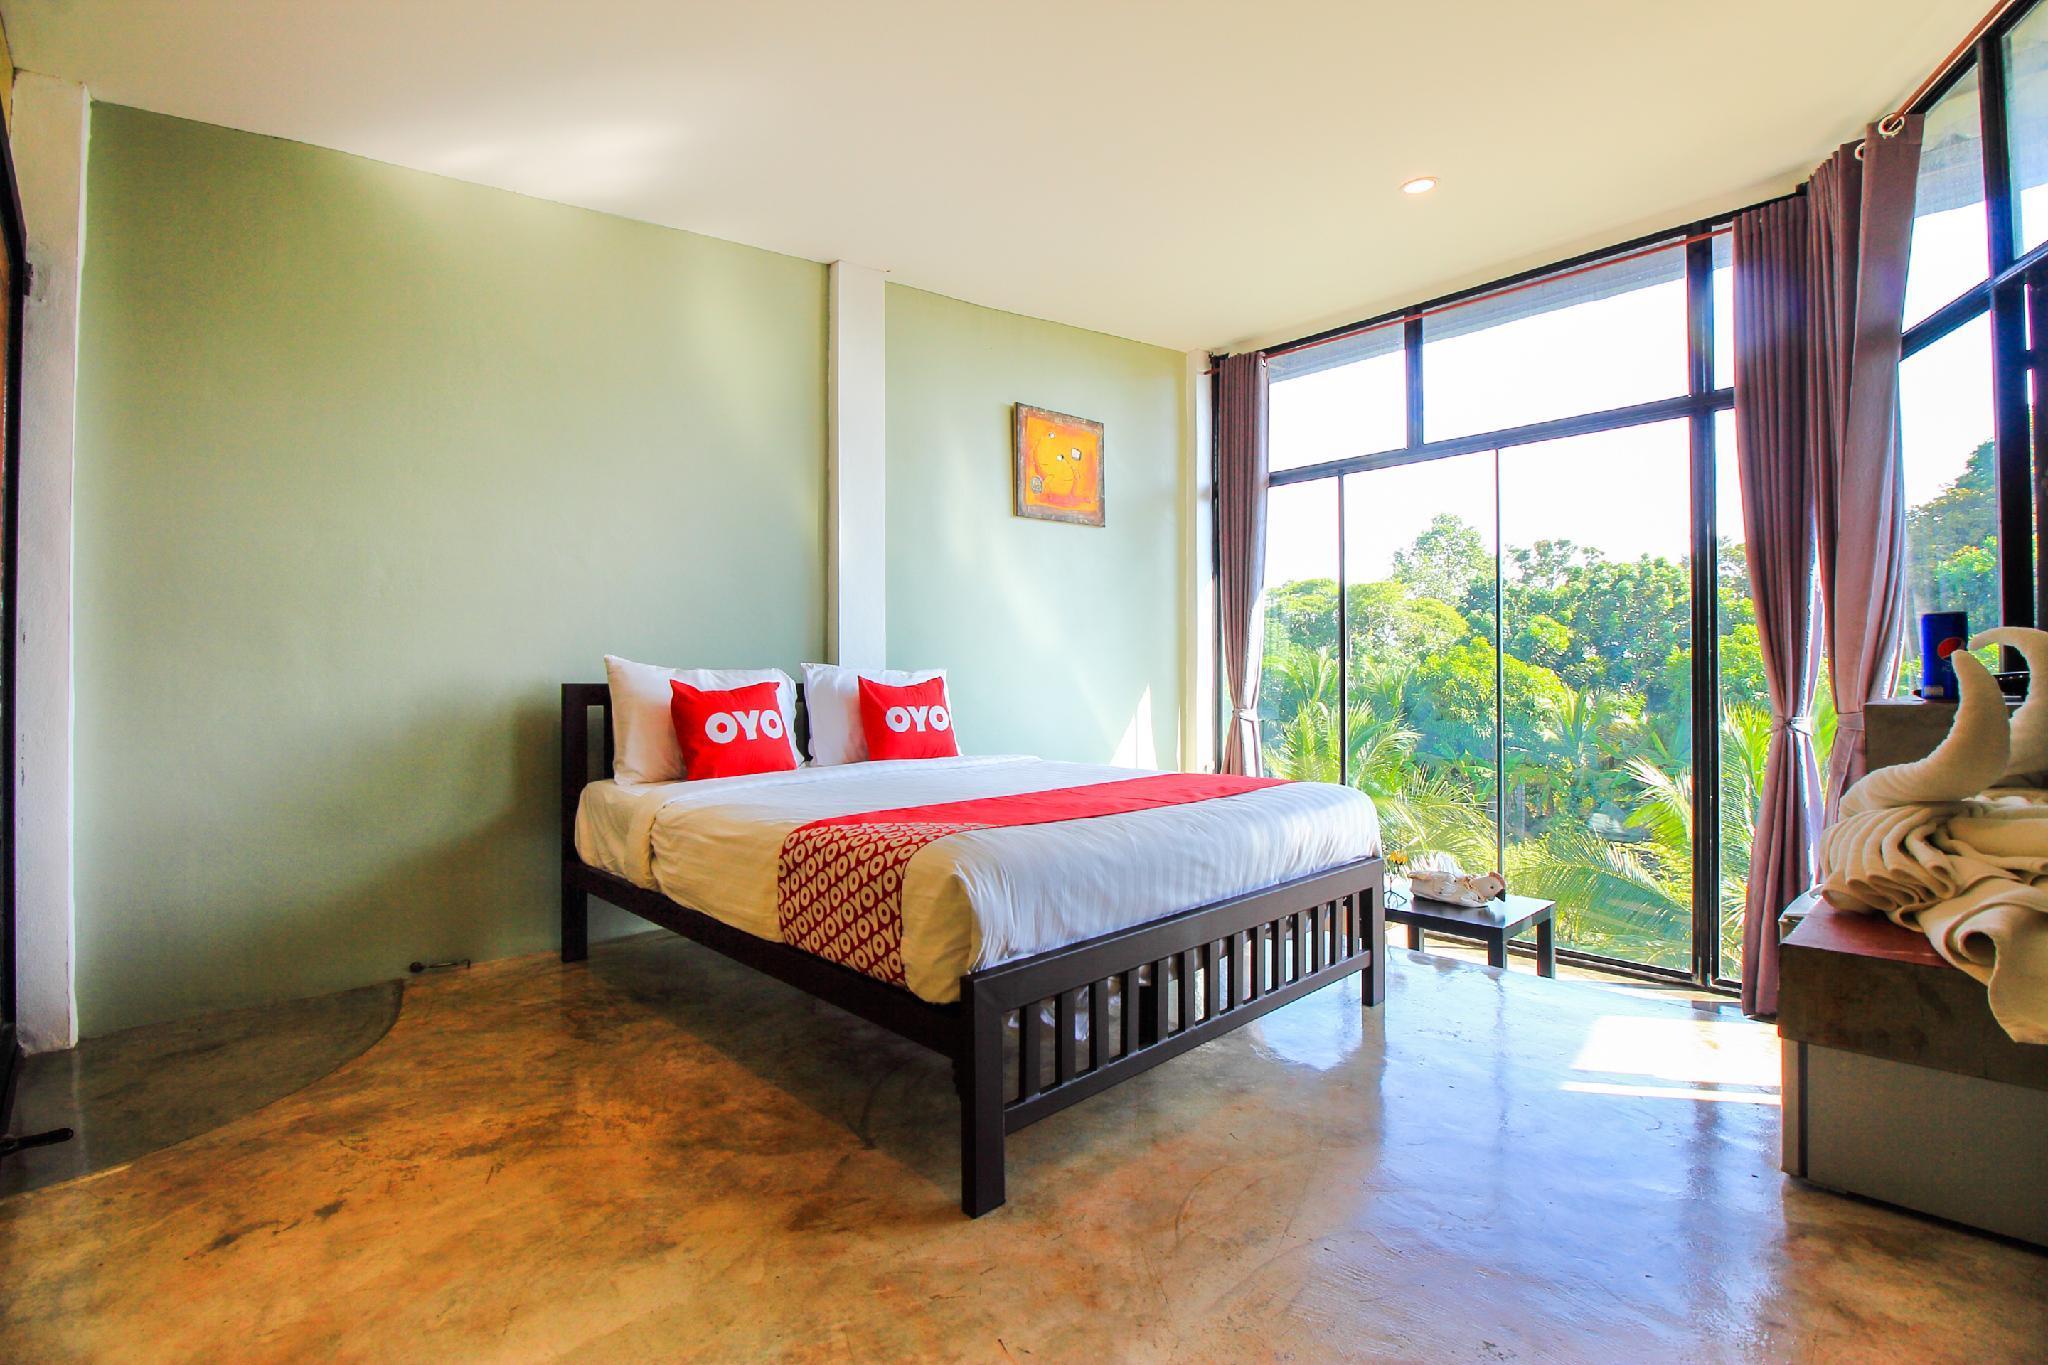 OYO 414 Plernsalaya Resort